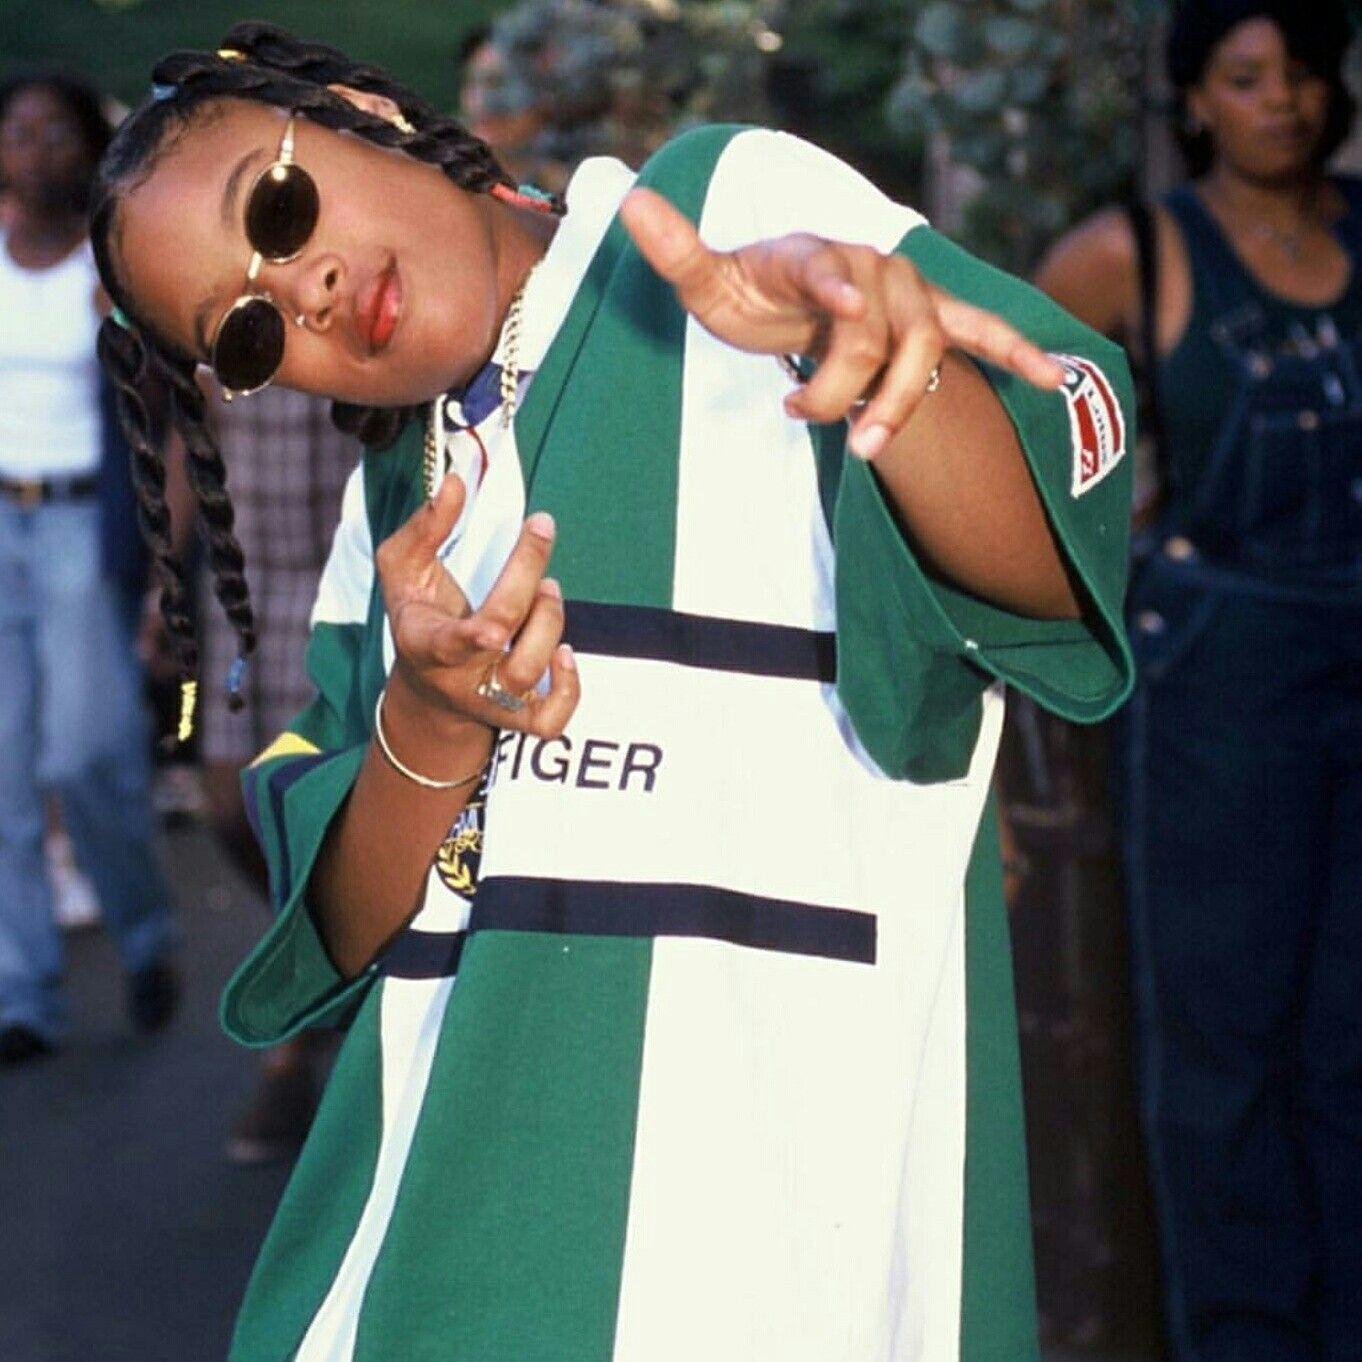 90s Hip Hop Rap Scene Vanguard Vintage Clothing Hip Hop Outfits 90s Fashion Outfits 90s Hip Hop Fashion